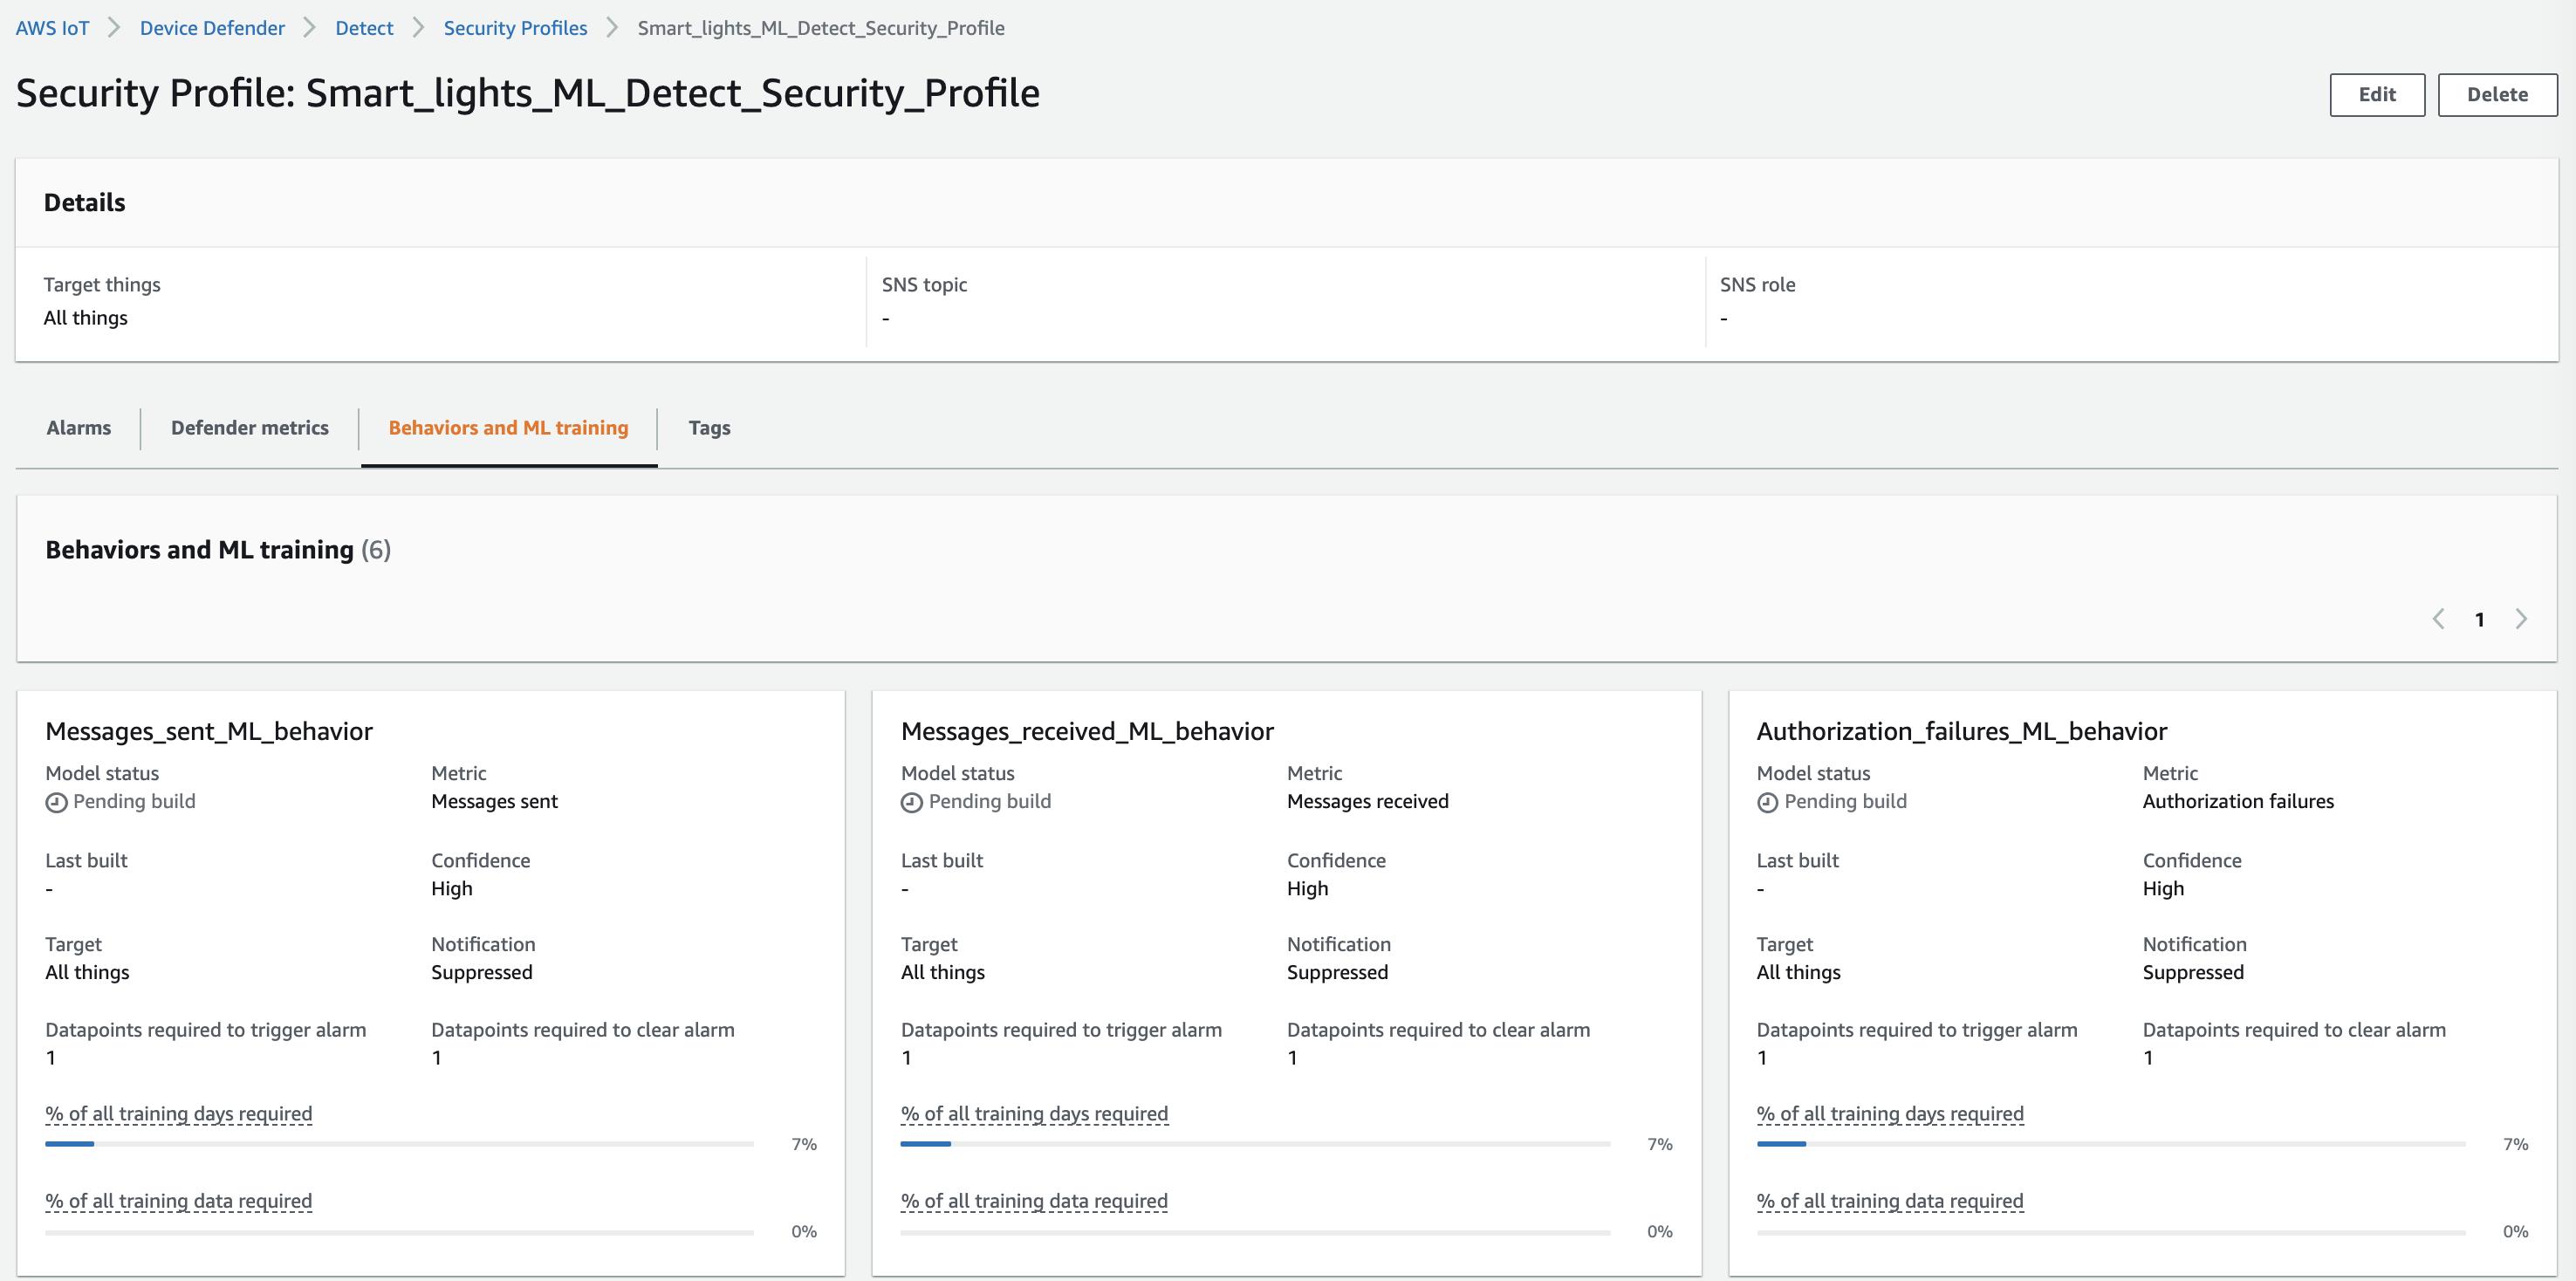 ML Detect security profile status